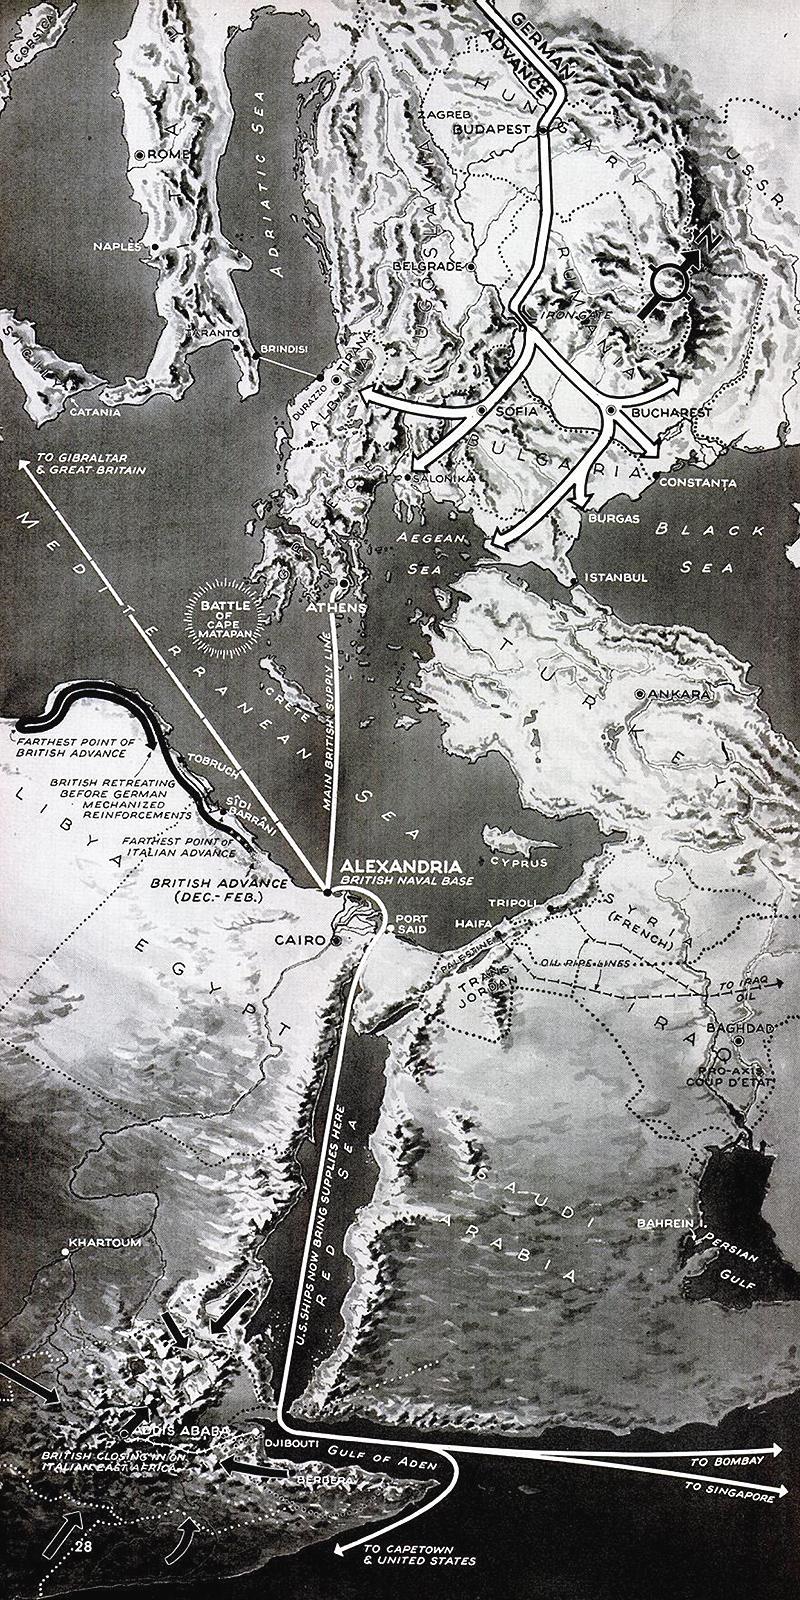 1941 Eastern Mediterranean map